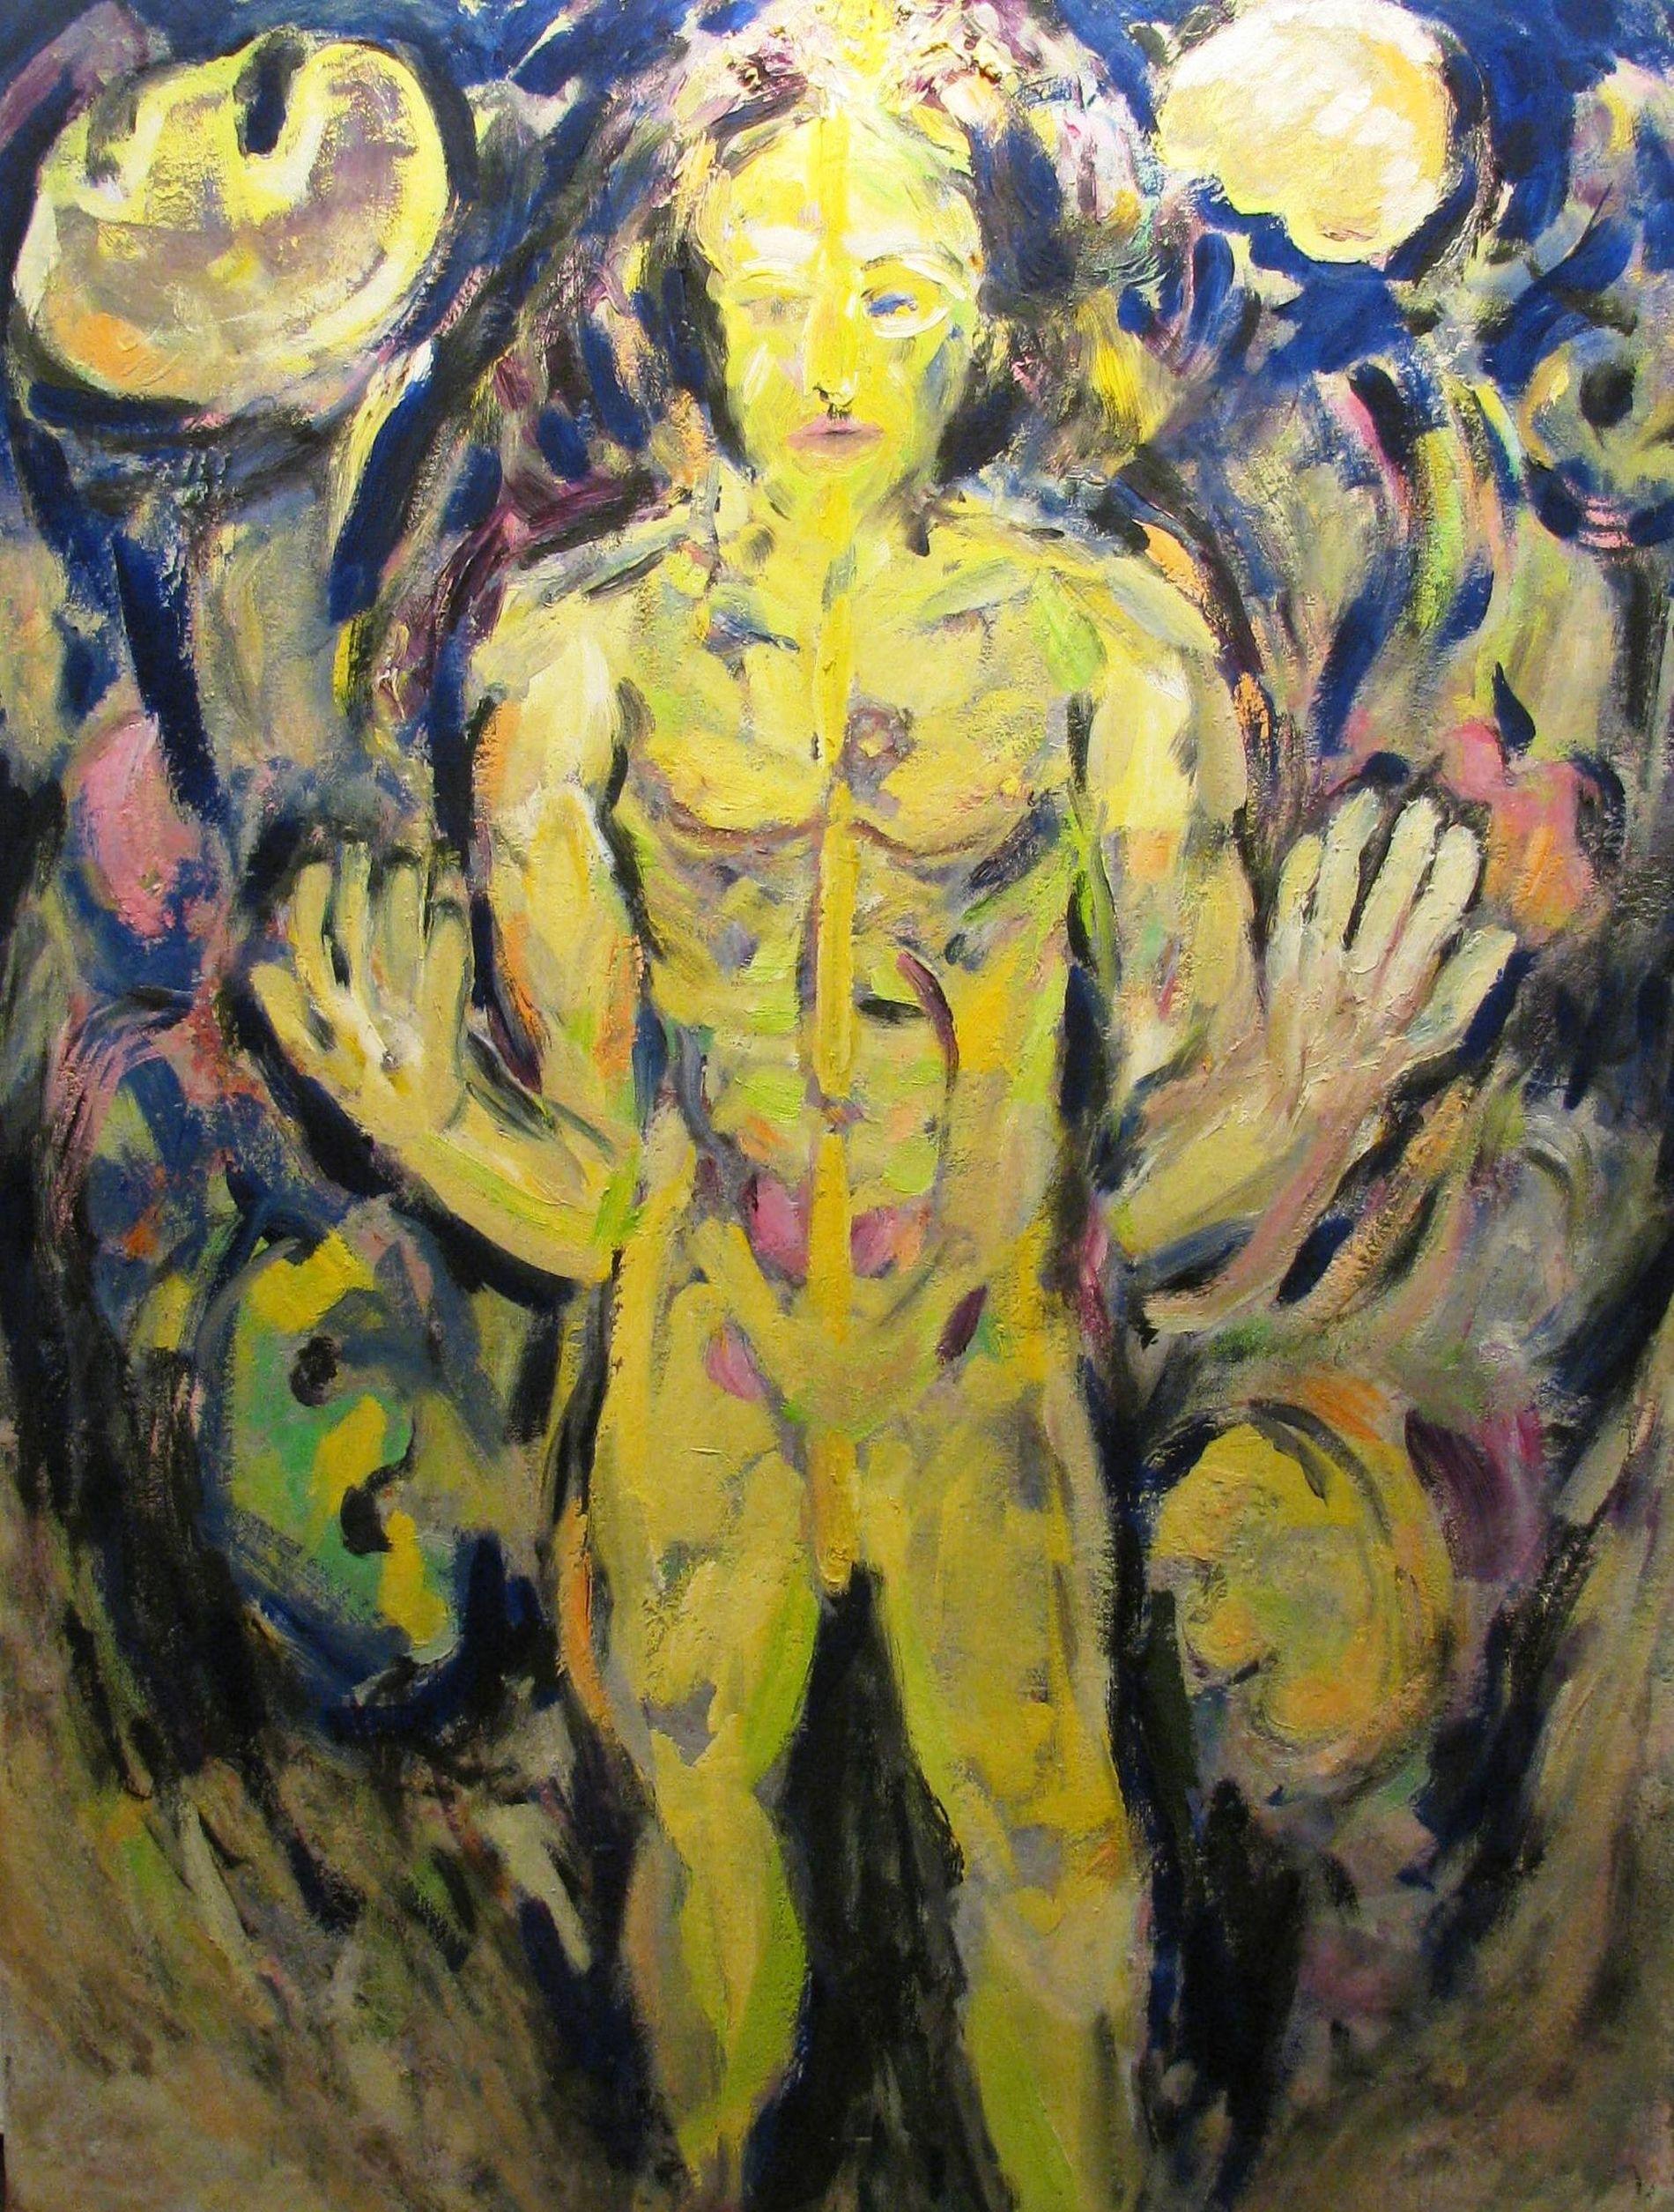 Adler, Andrew Hart, Kunst Galerie Voigt Nürnberg